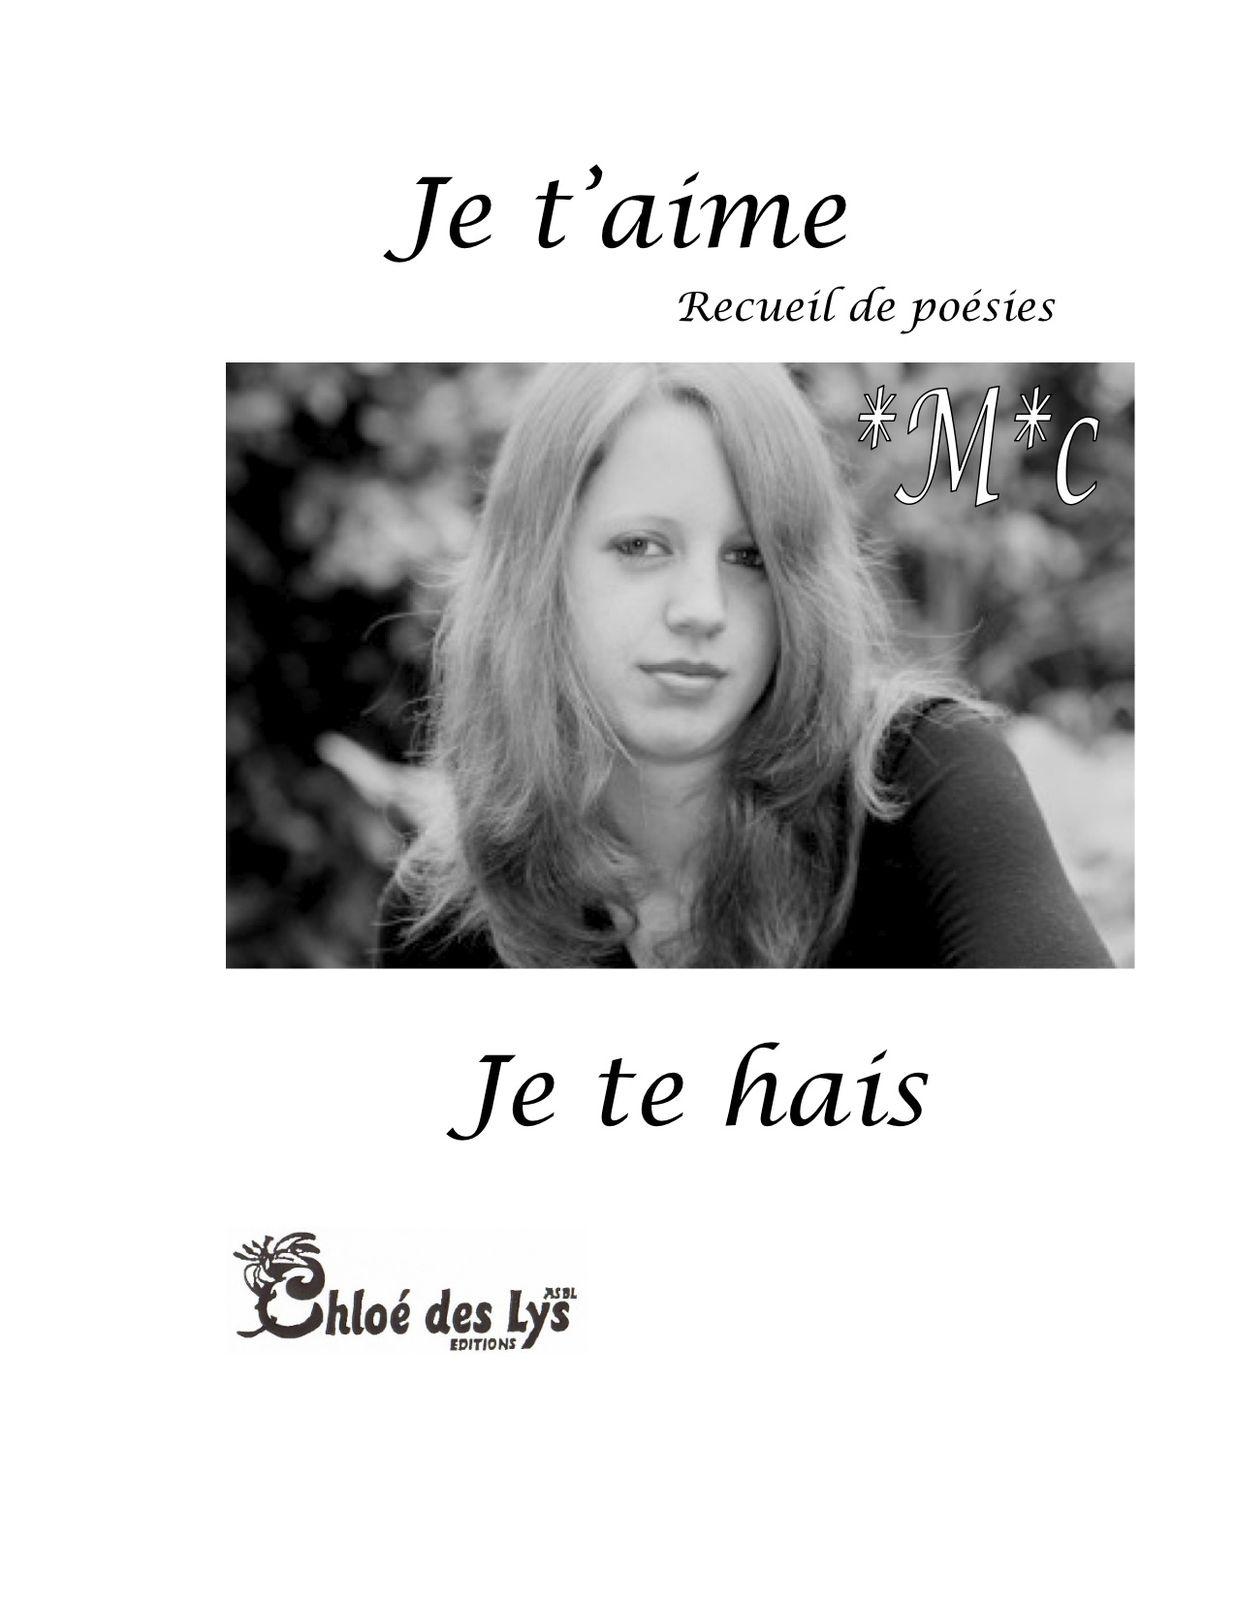 http://idata.over-blog.com/3/91/53/25/Je-t-aime-je-te-hais-couverture.jpg